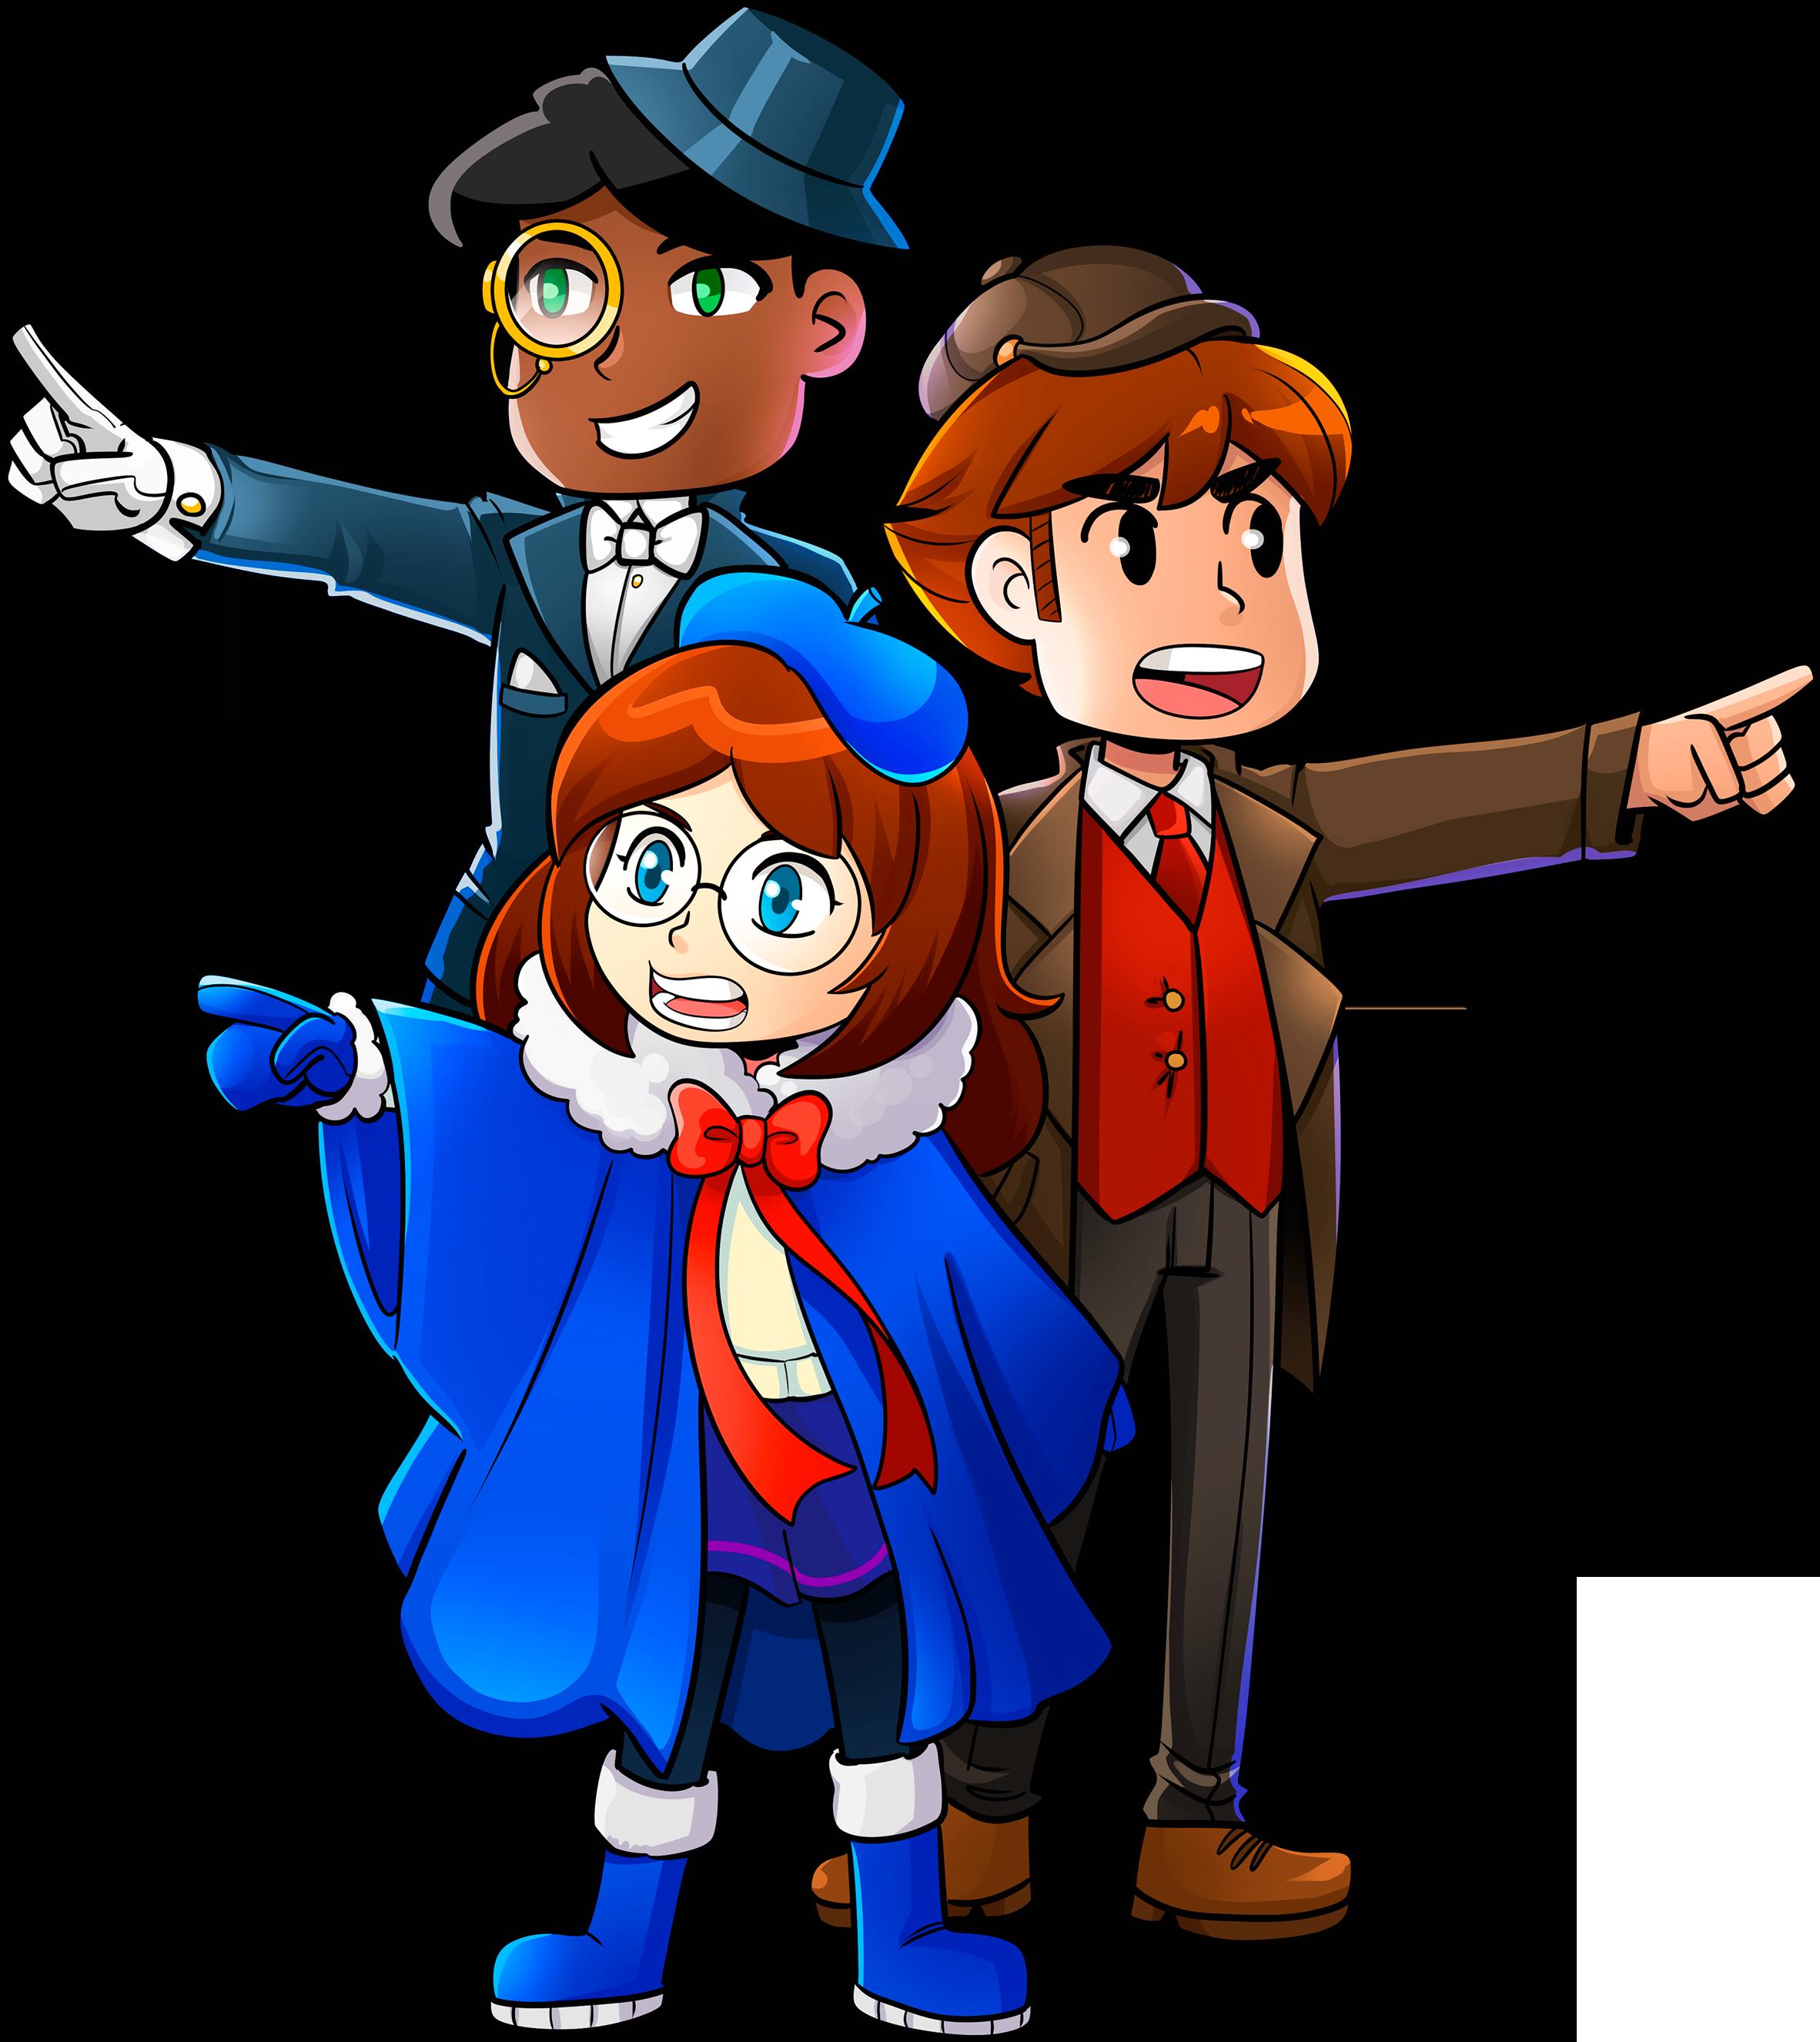 1,2 BLAME - Characters